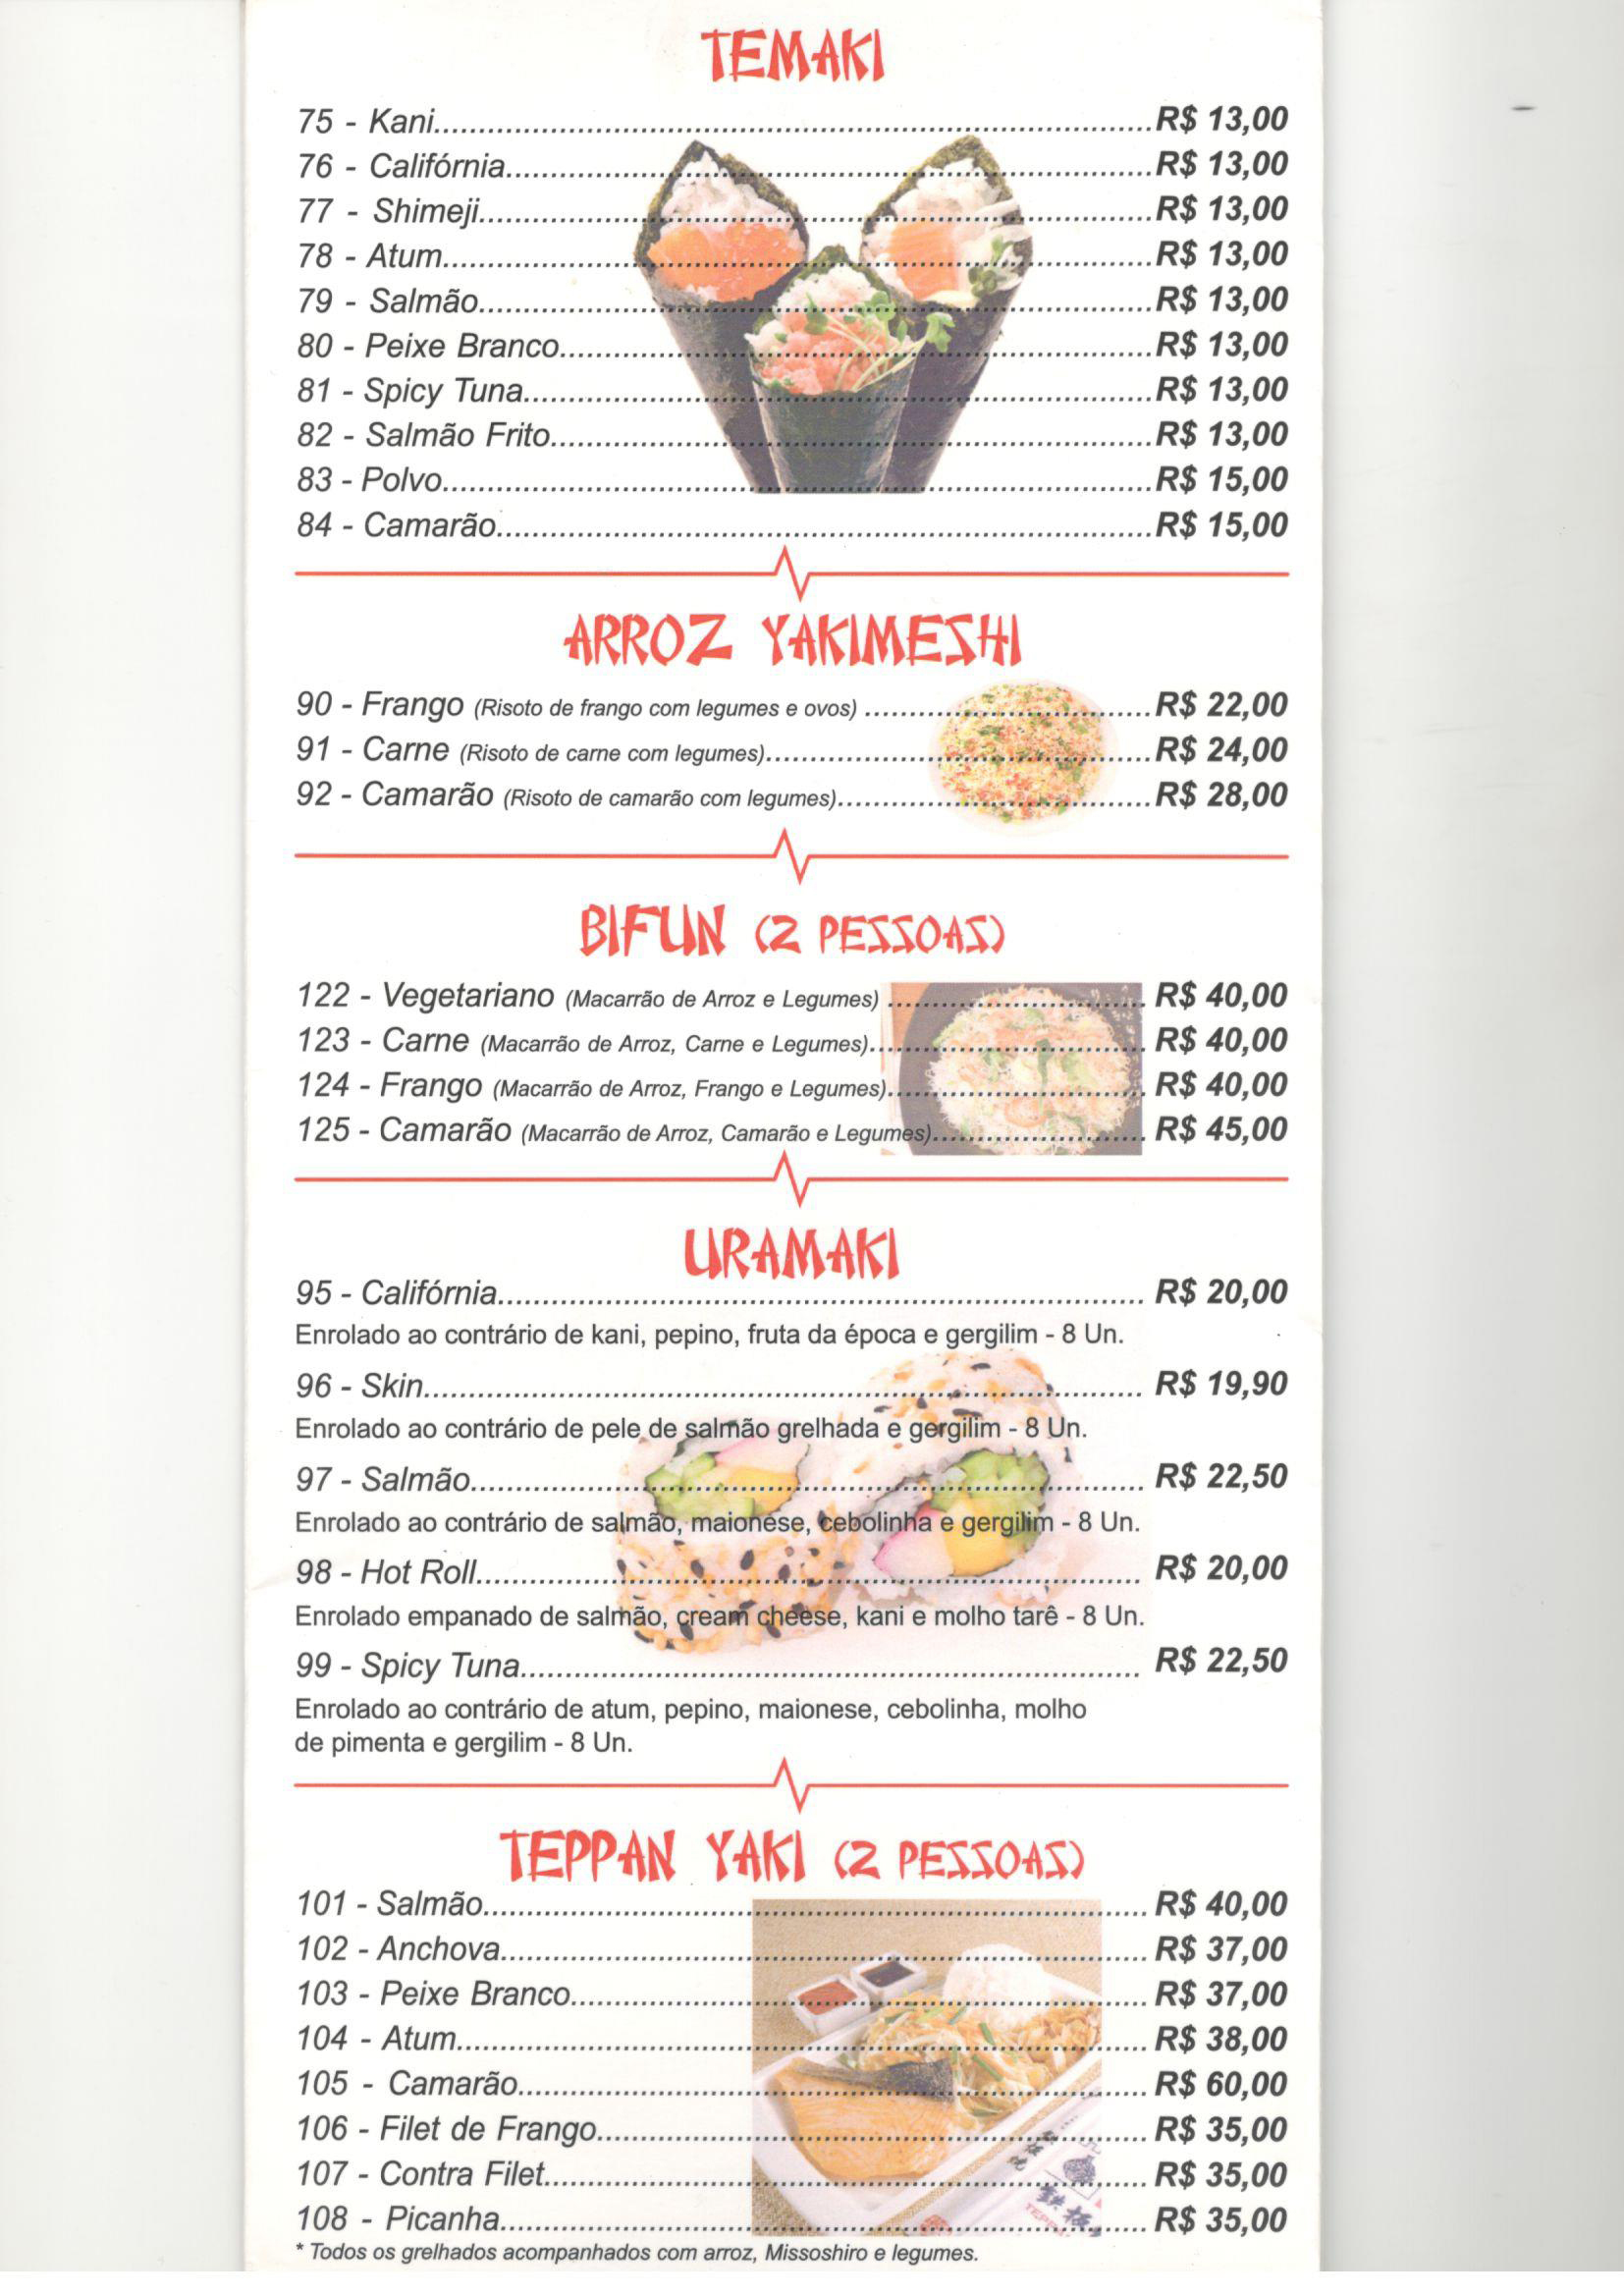 restaurante-guaruja-japo-cardapio-3